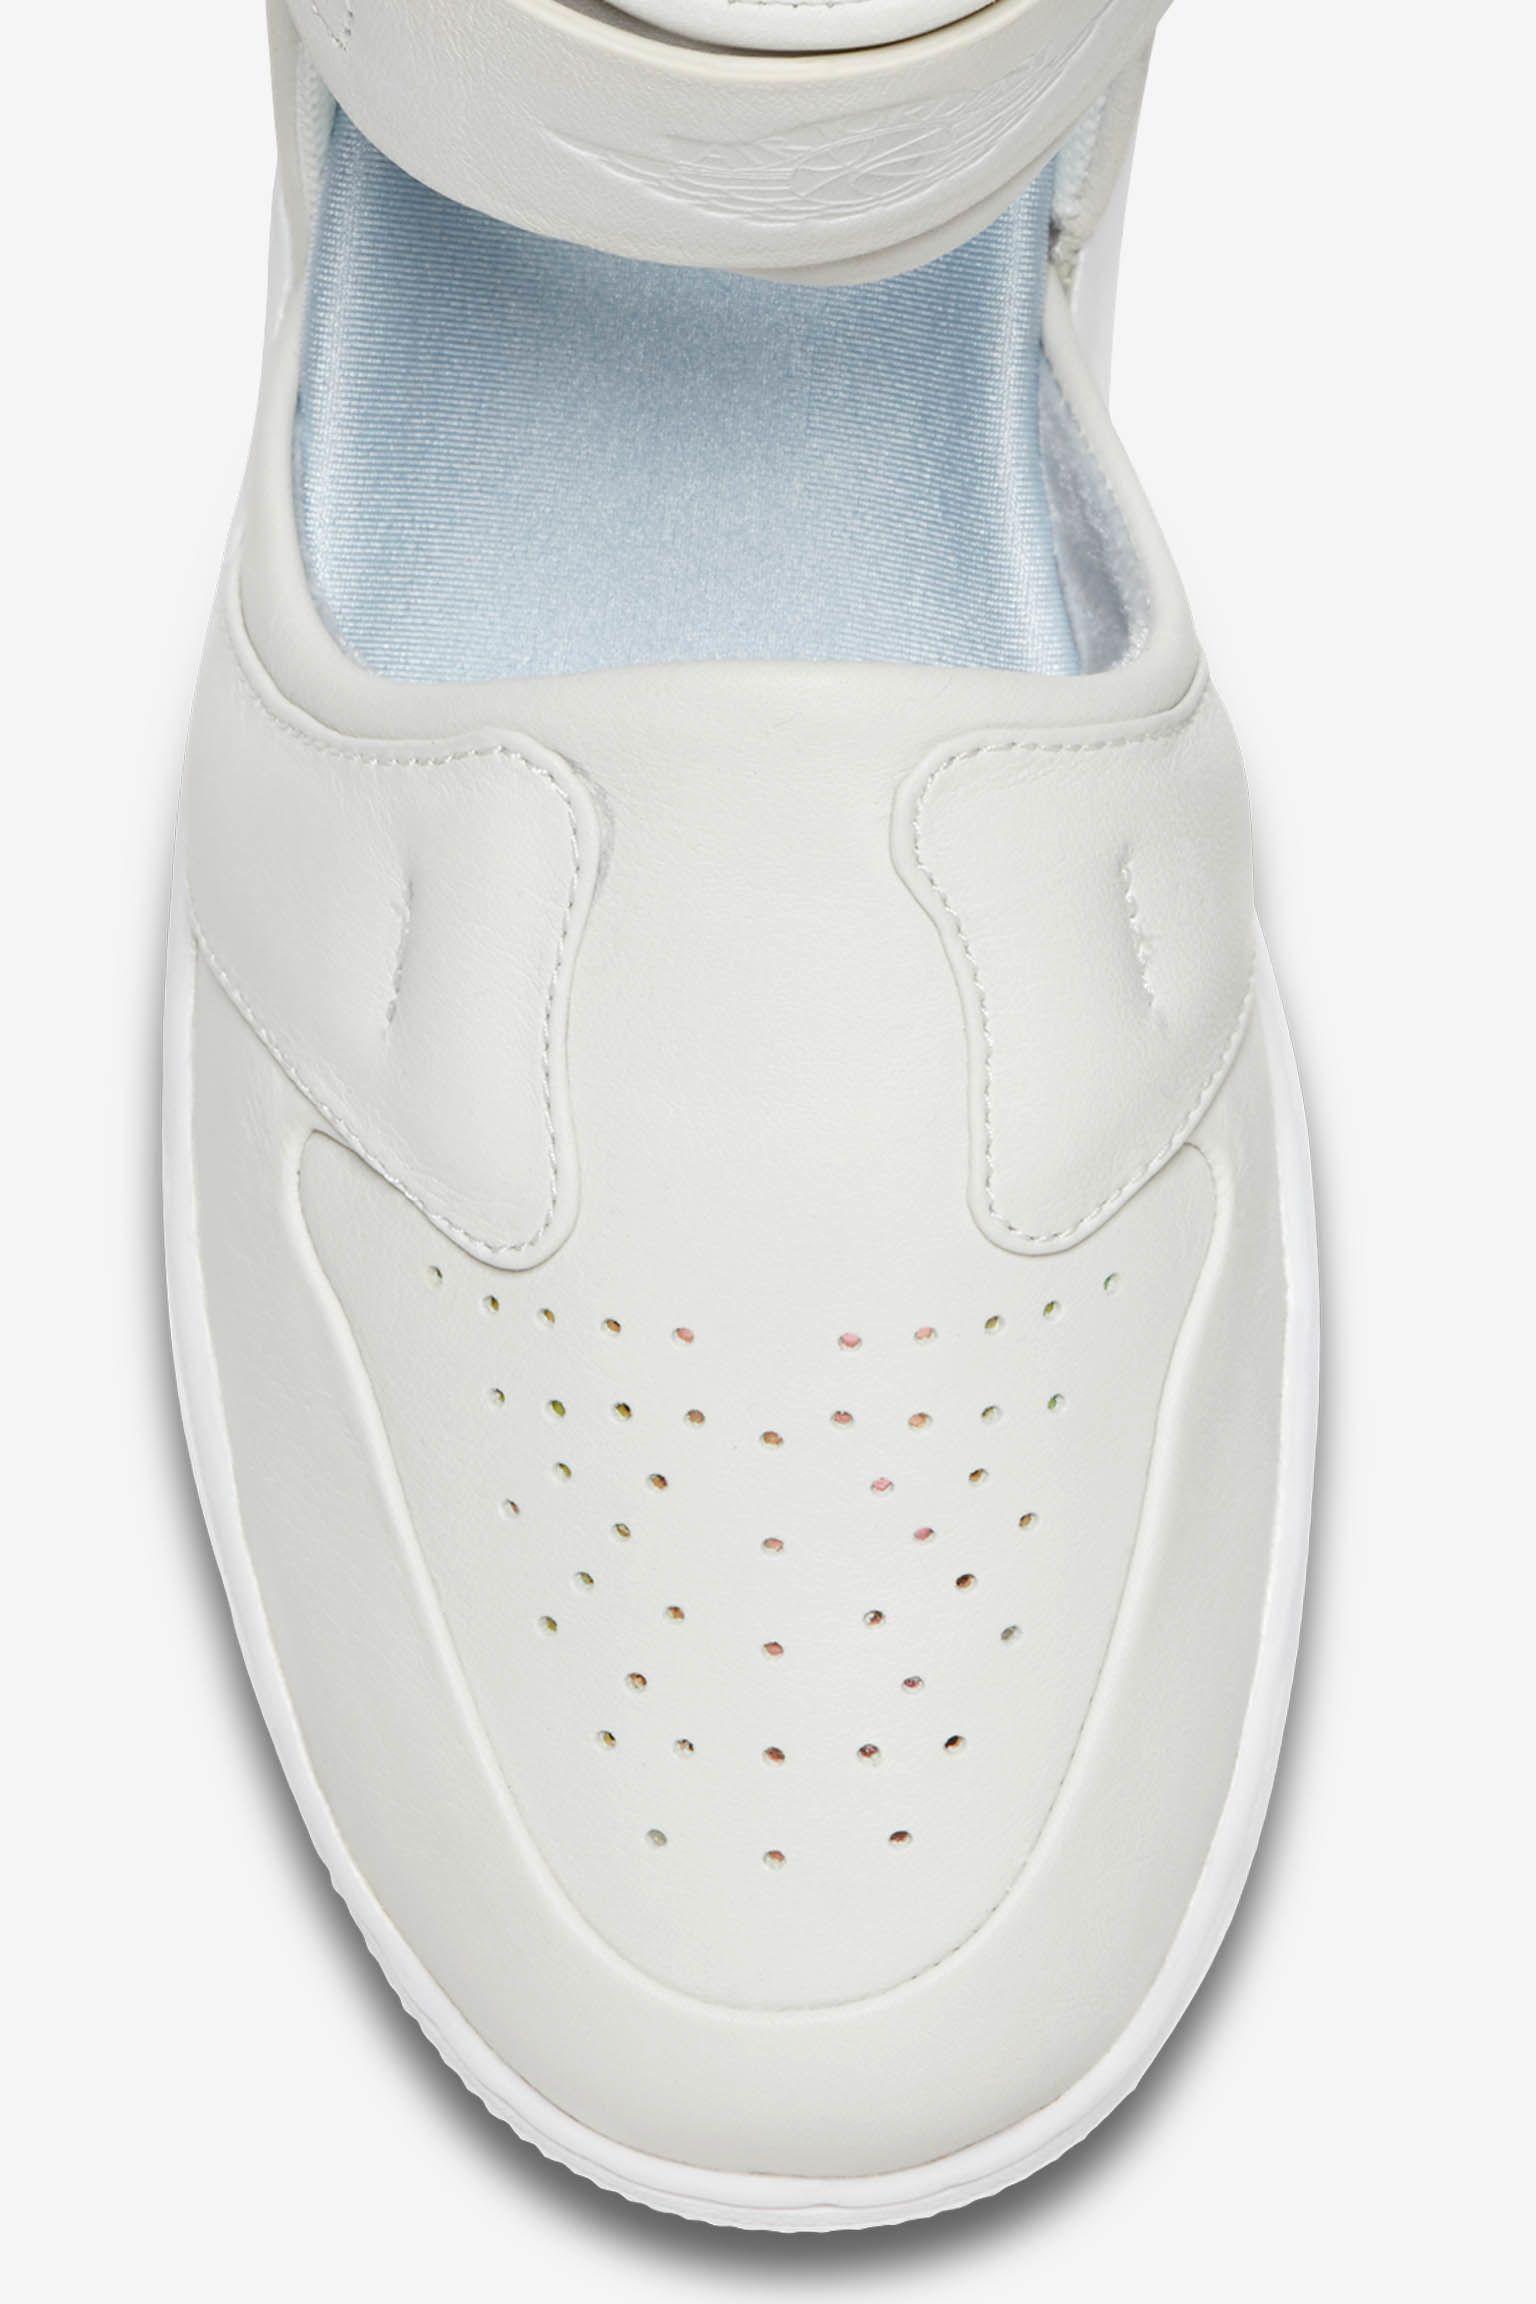 Wmns Air Jordan 1 High 'Lover XX'